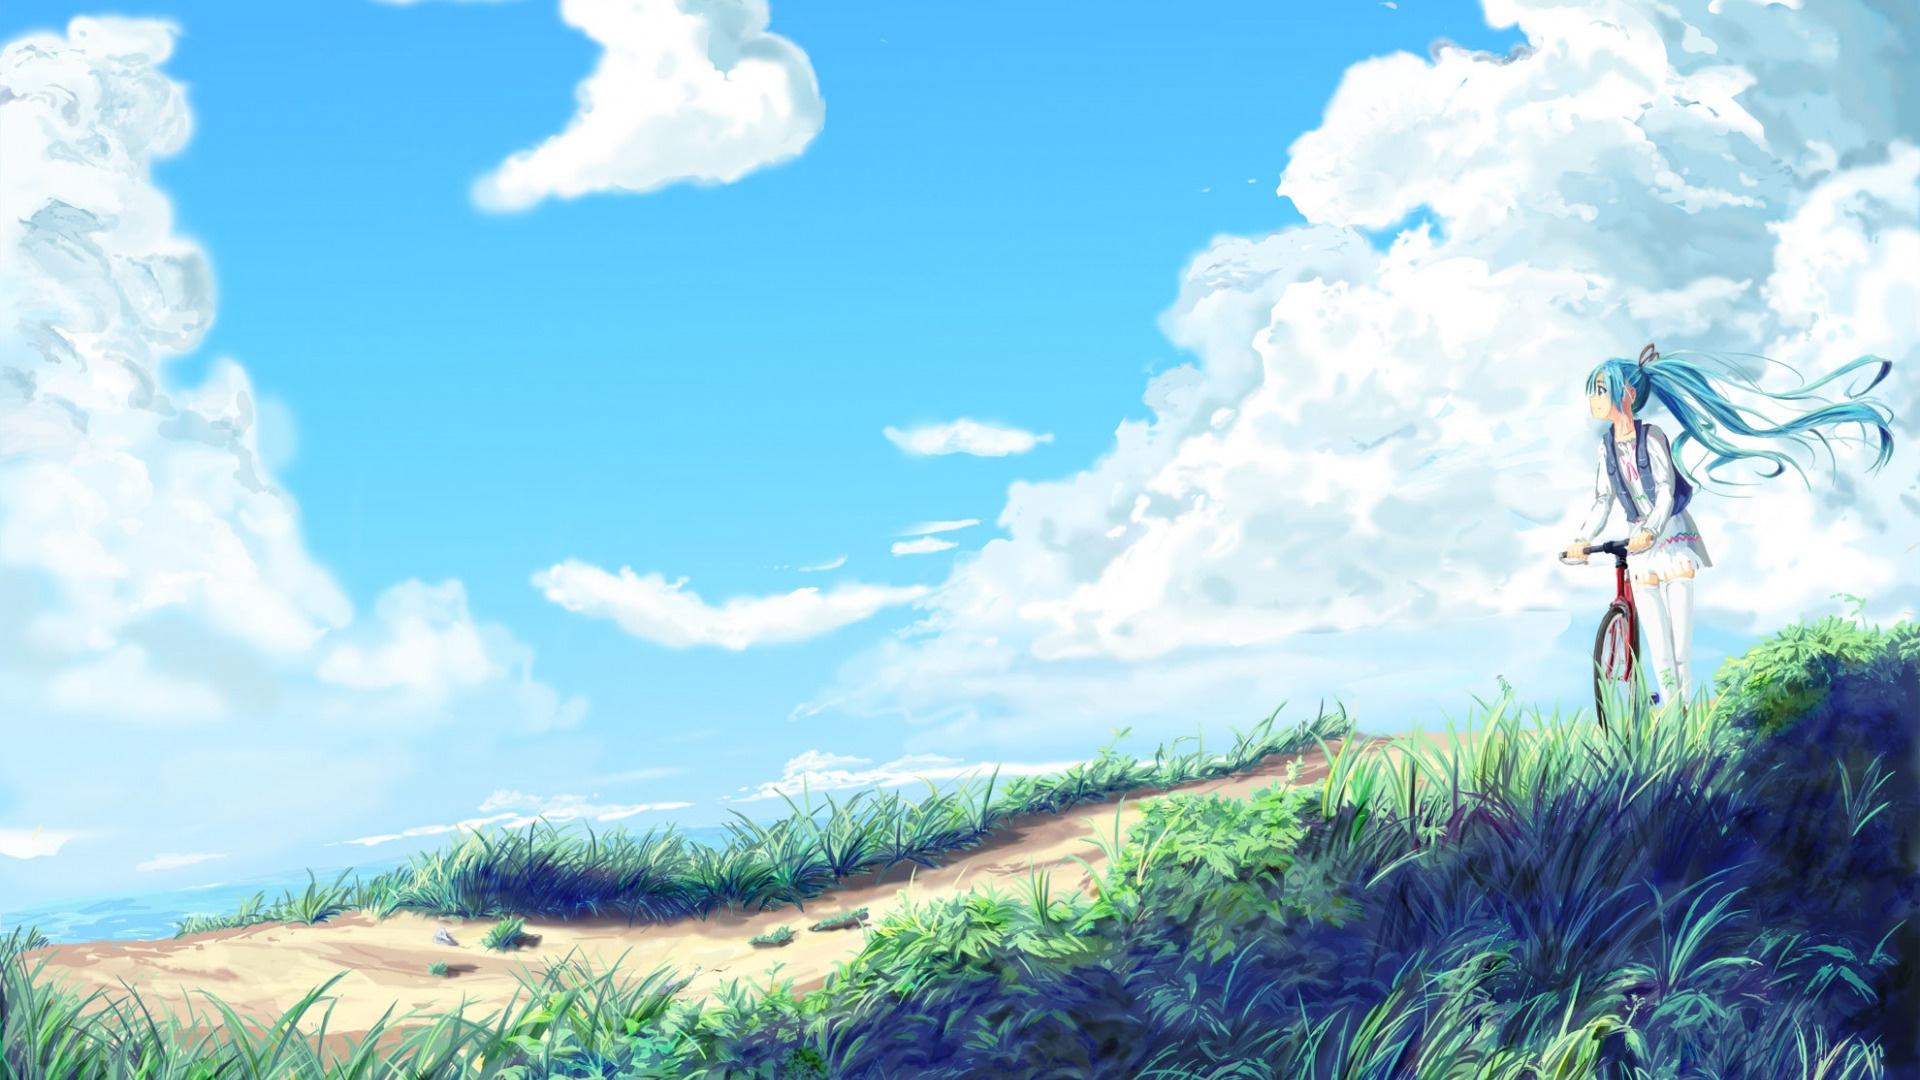 Anime Landscape With Clouds desktop wallpaper free download